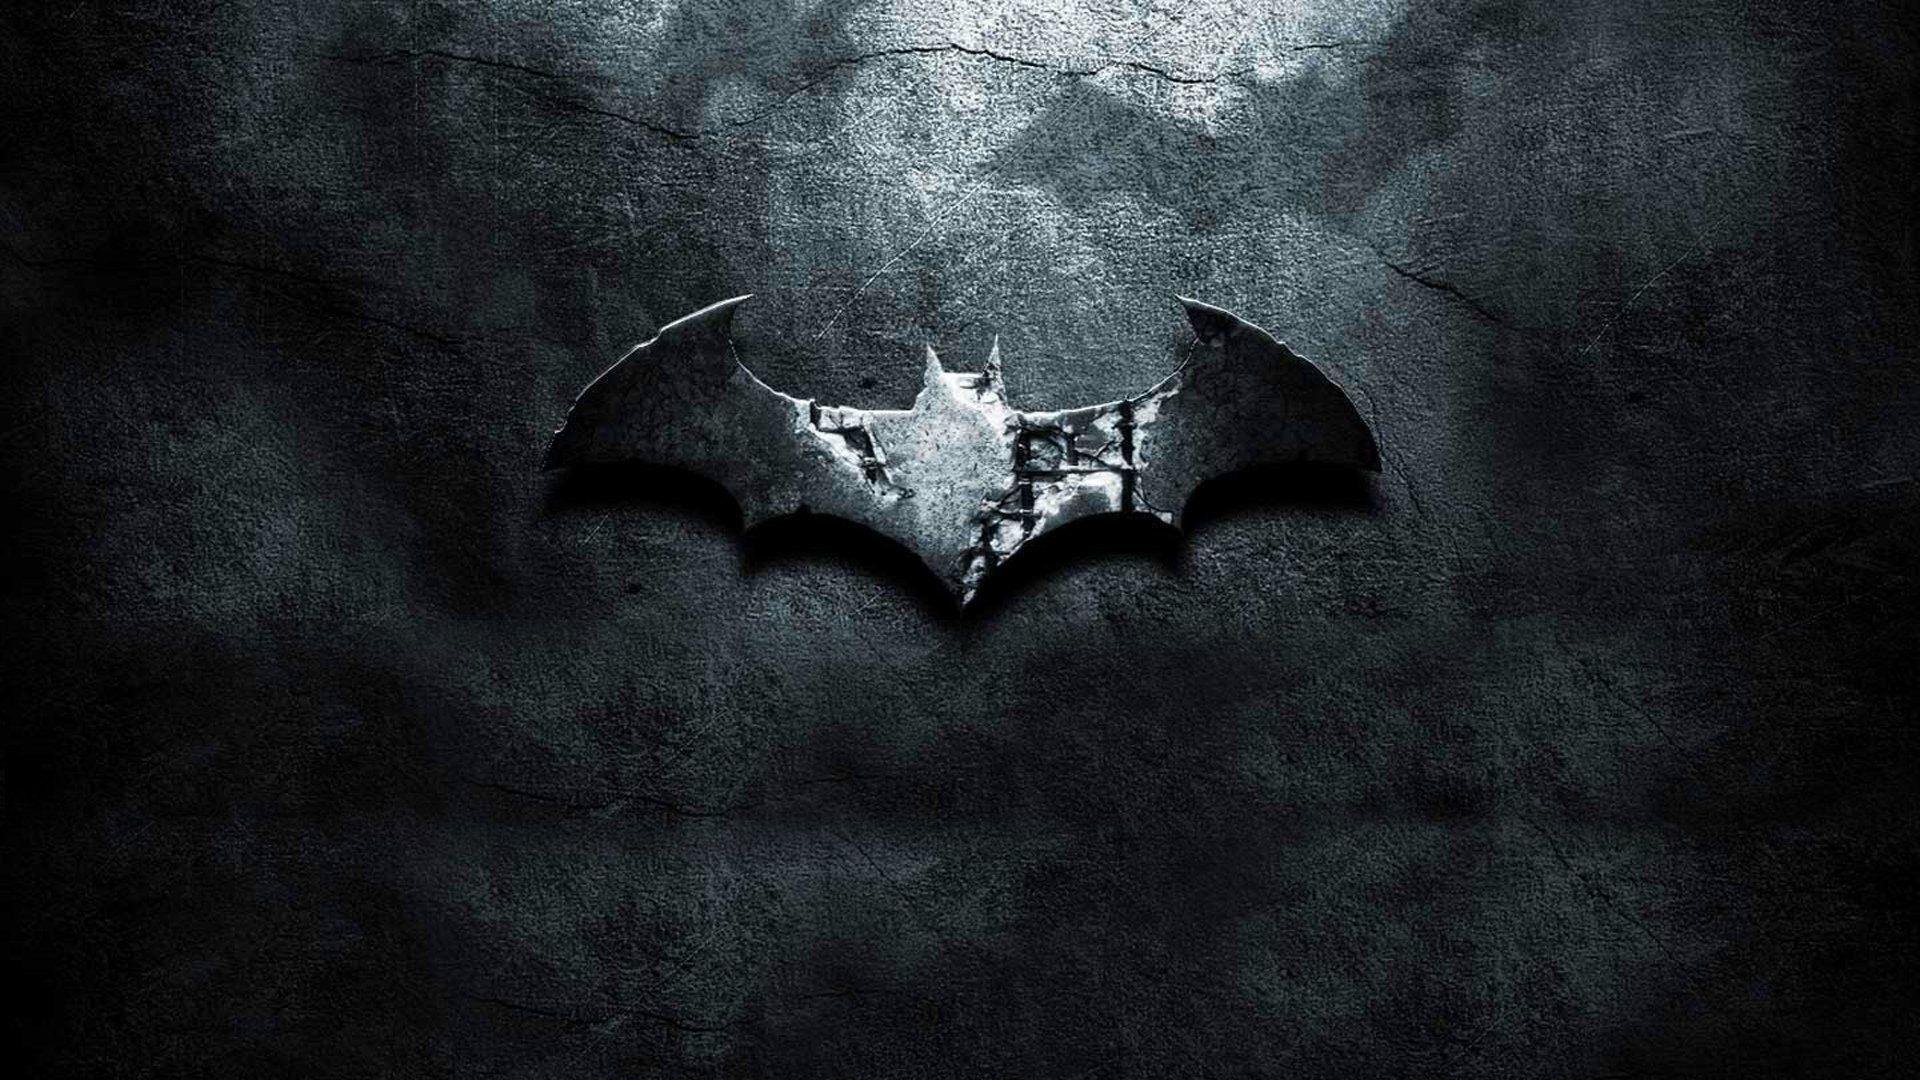 Wallpapers For > Batman Logo Wallpaper Hd 1080p